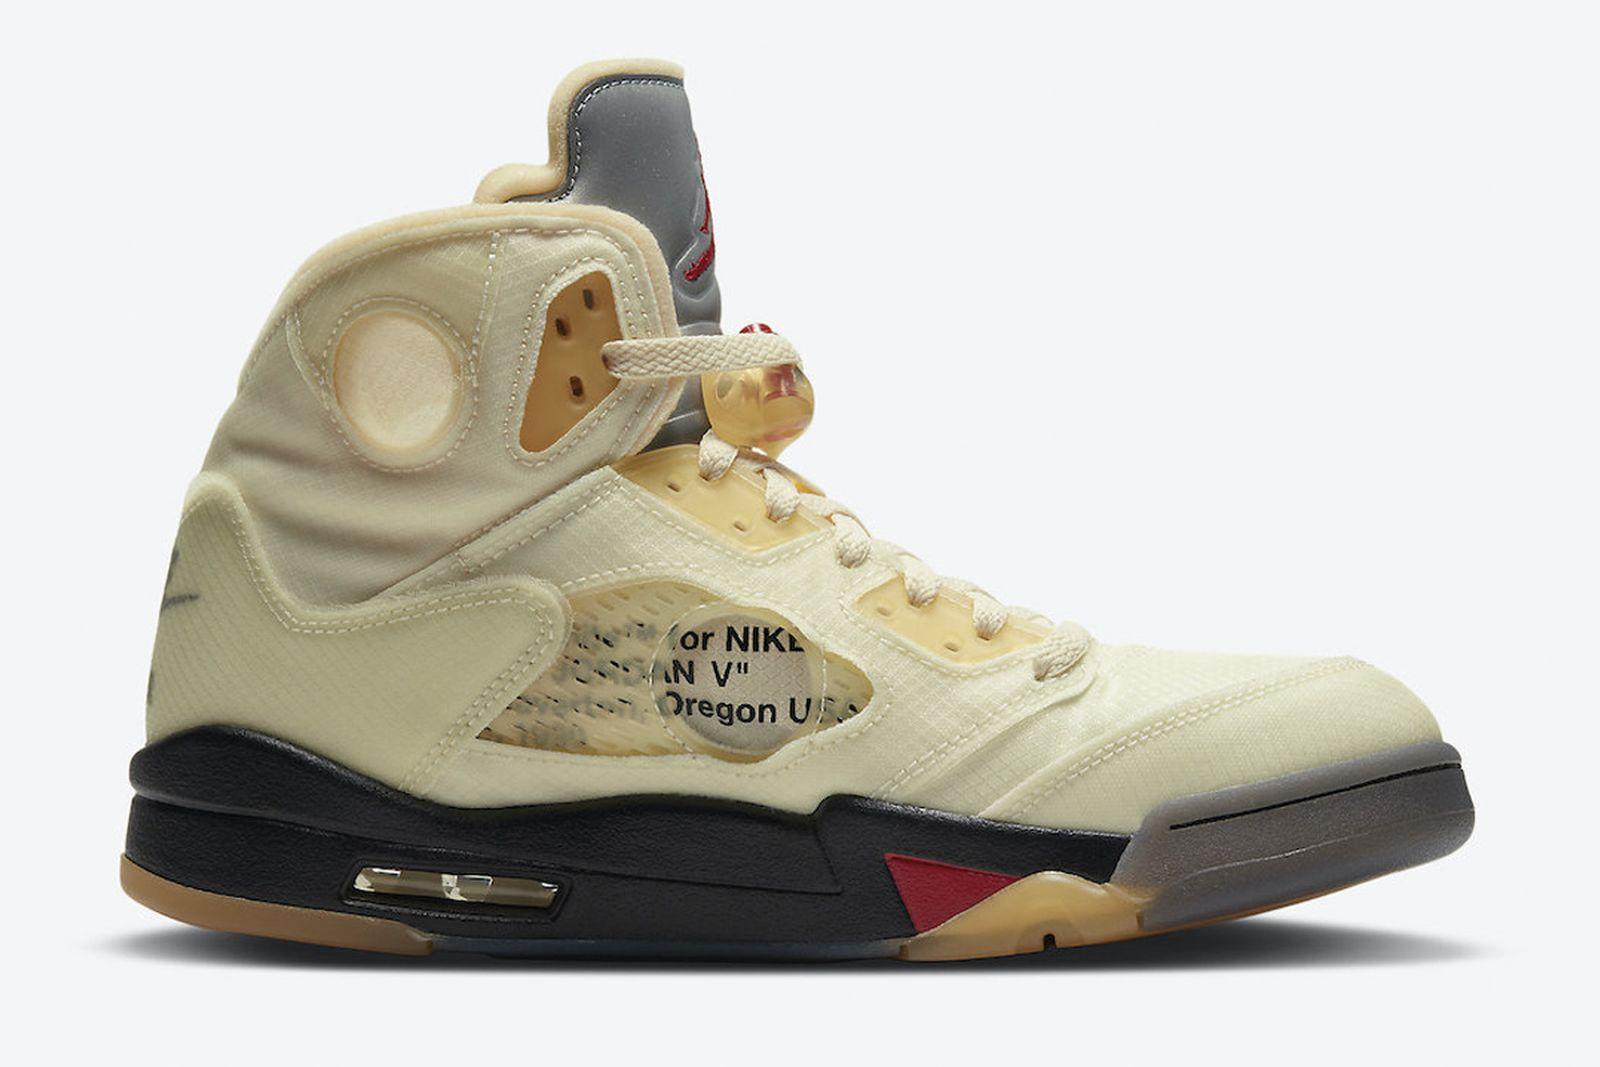 off-white-air-jordan-5-white-release-date-price-0-04